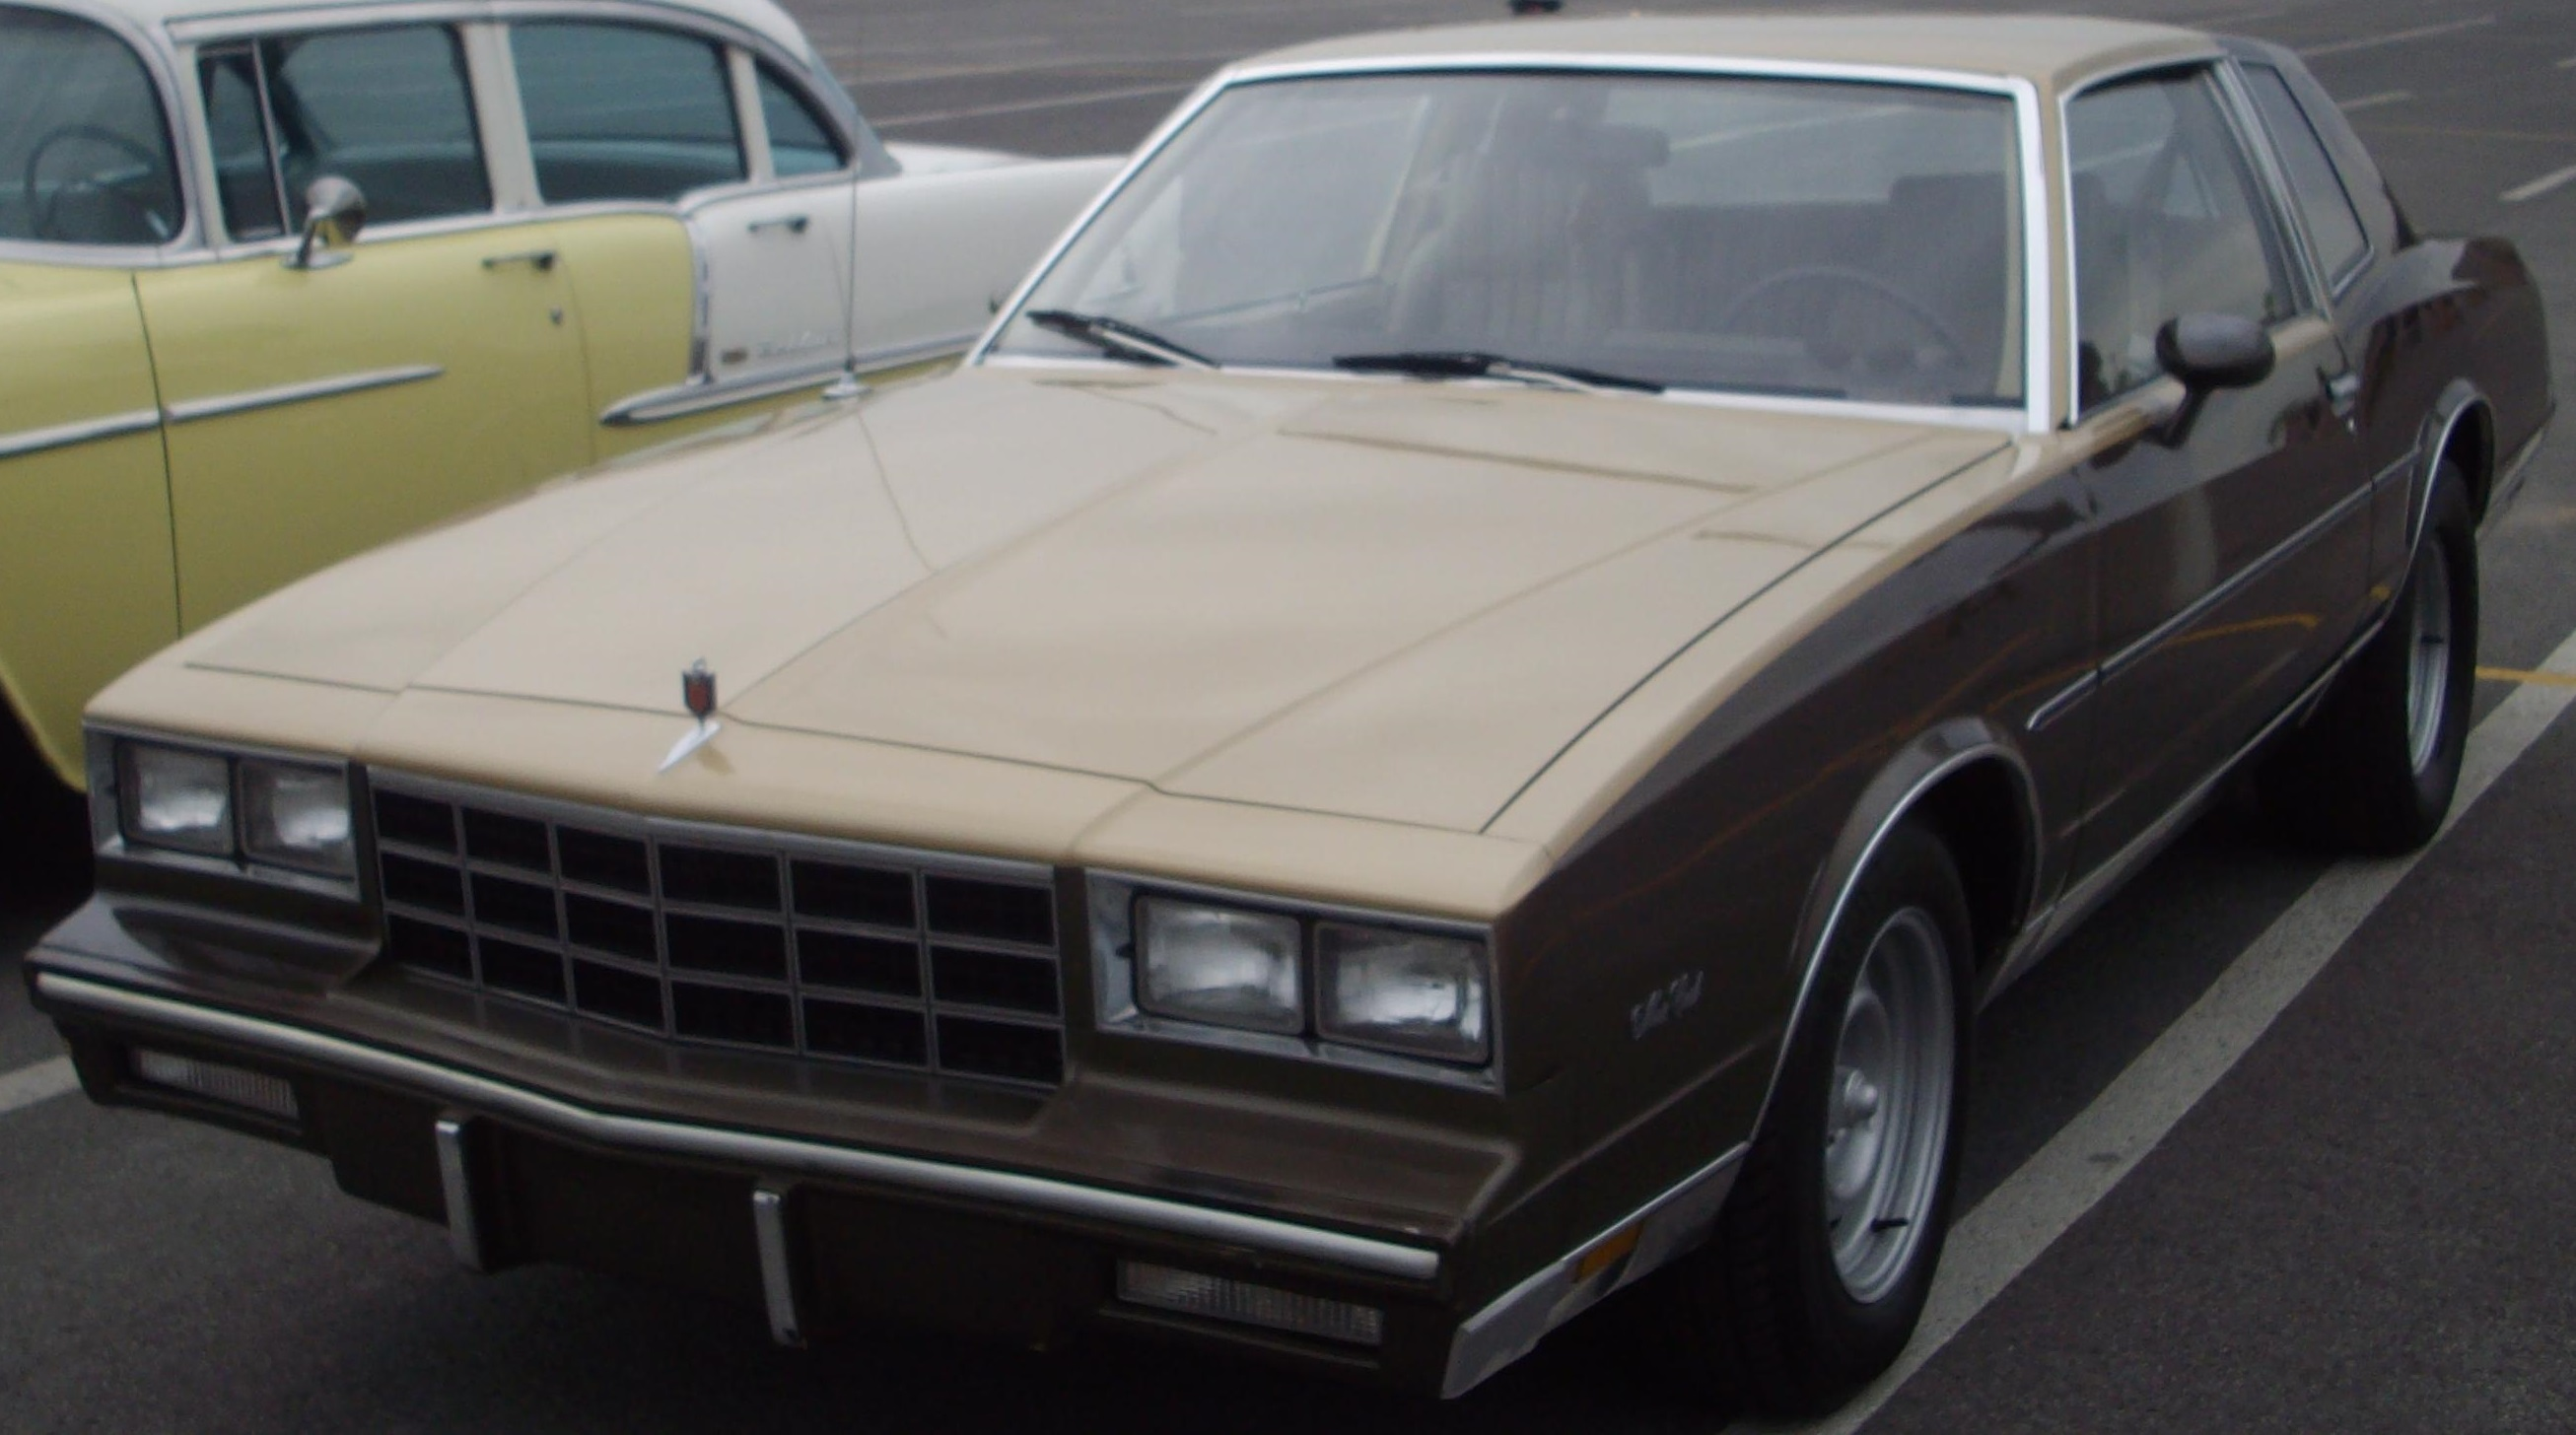 File 81 Chevrolet Monte Carlo Les Chauds Vendredis 12